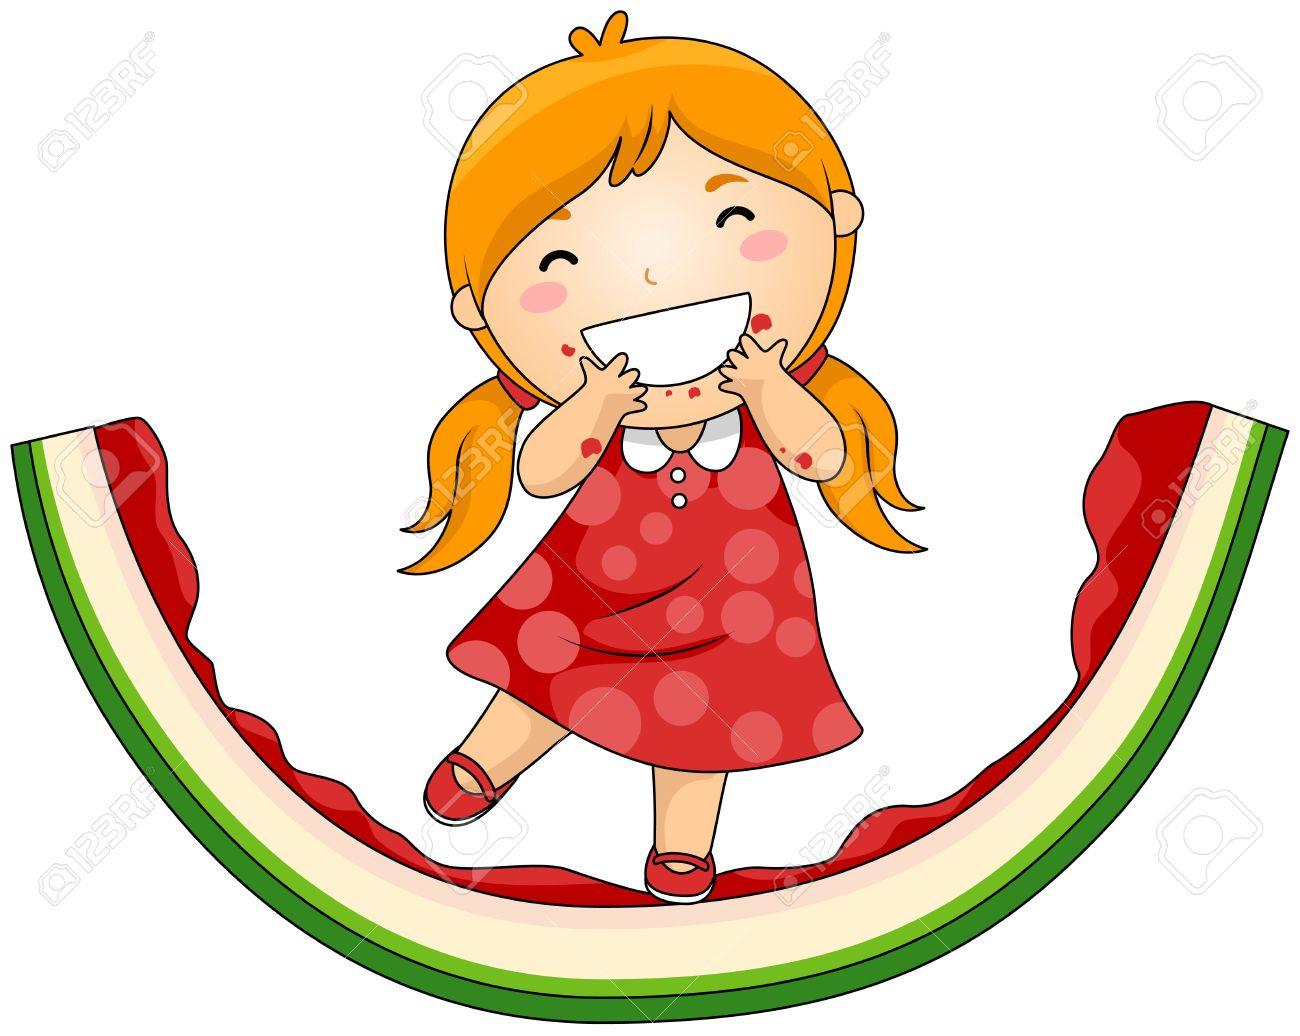 Cartoon Kid Eating Watermelon